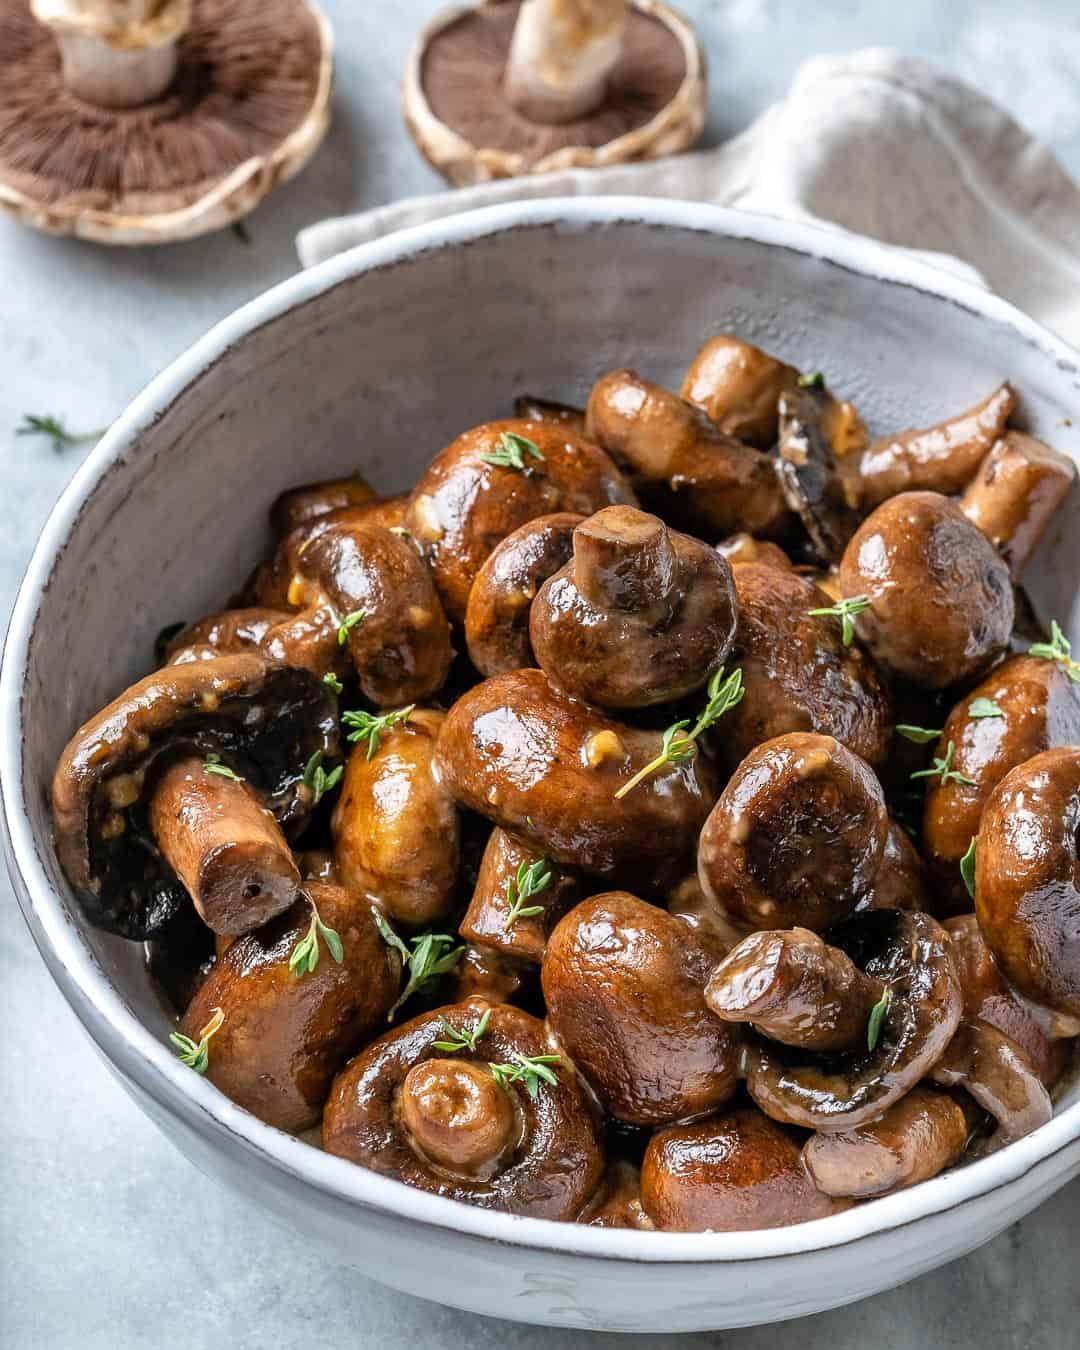 keto creamy mushroom recipe